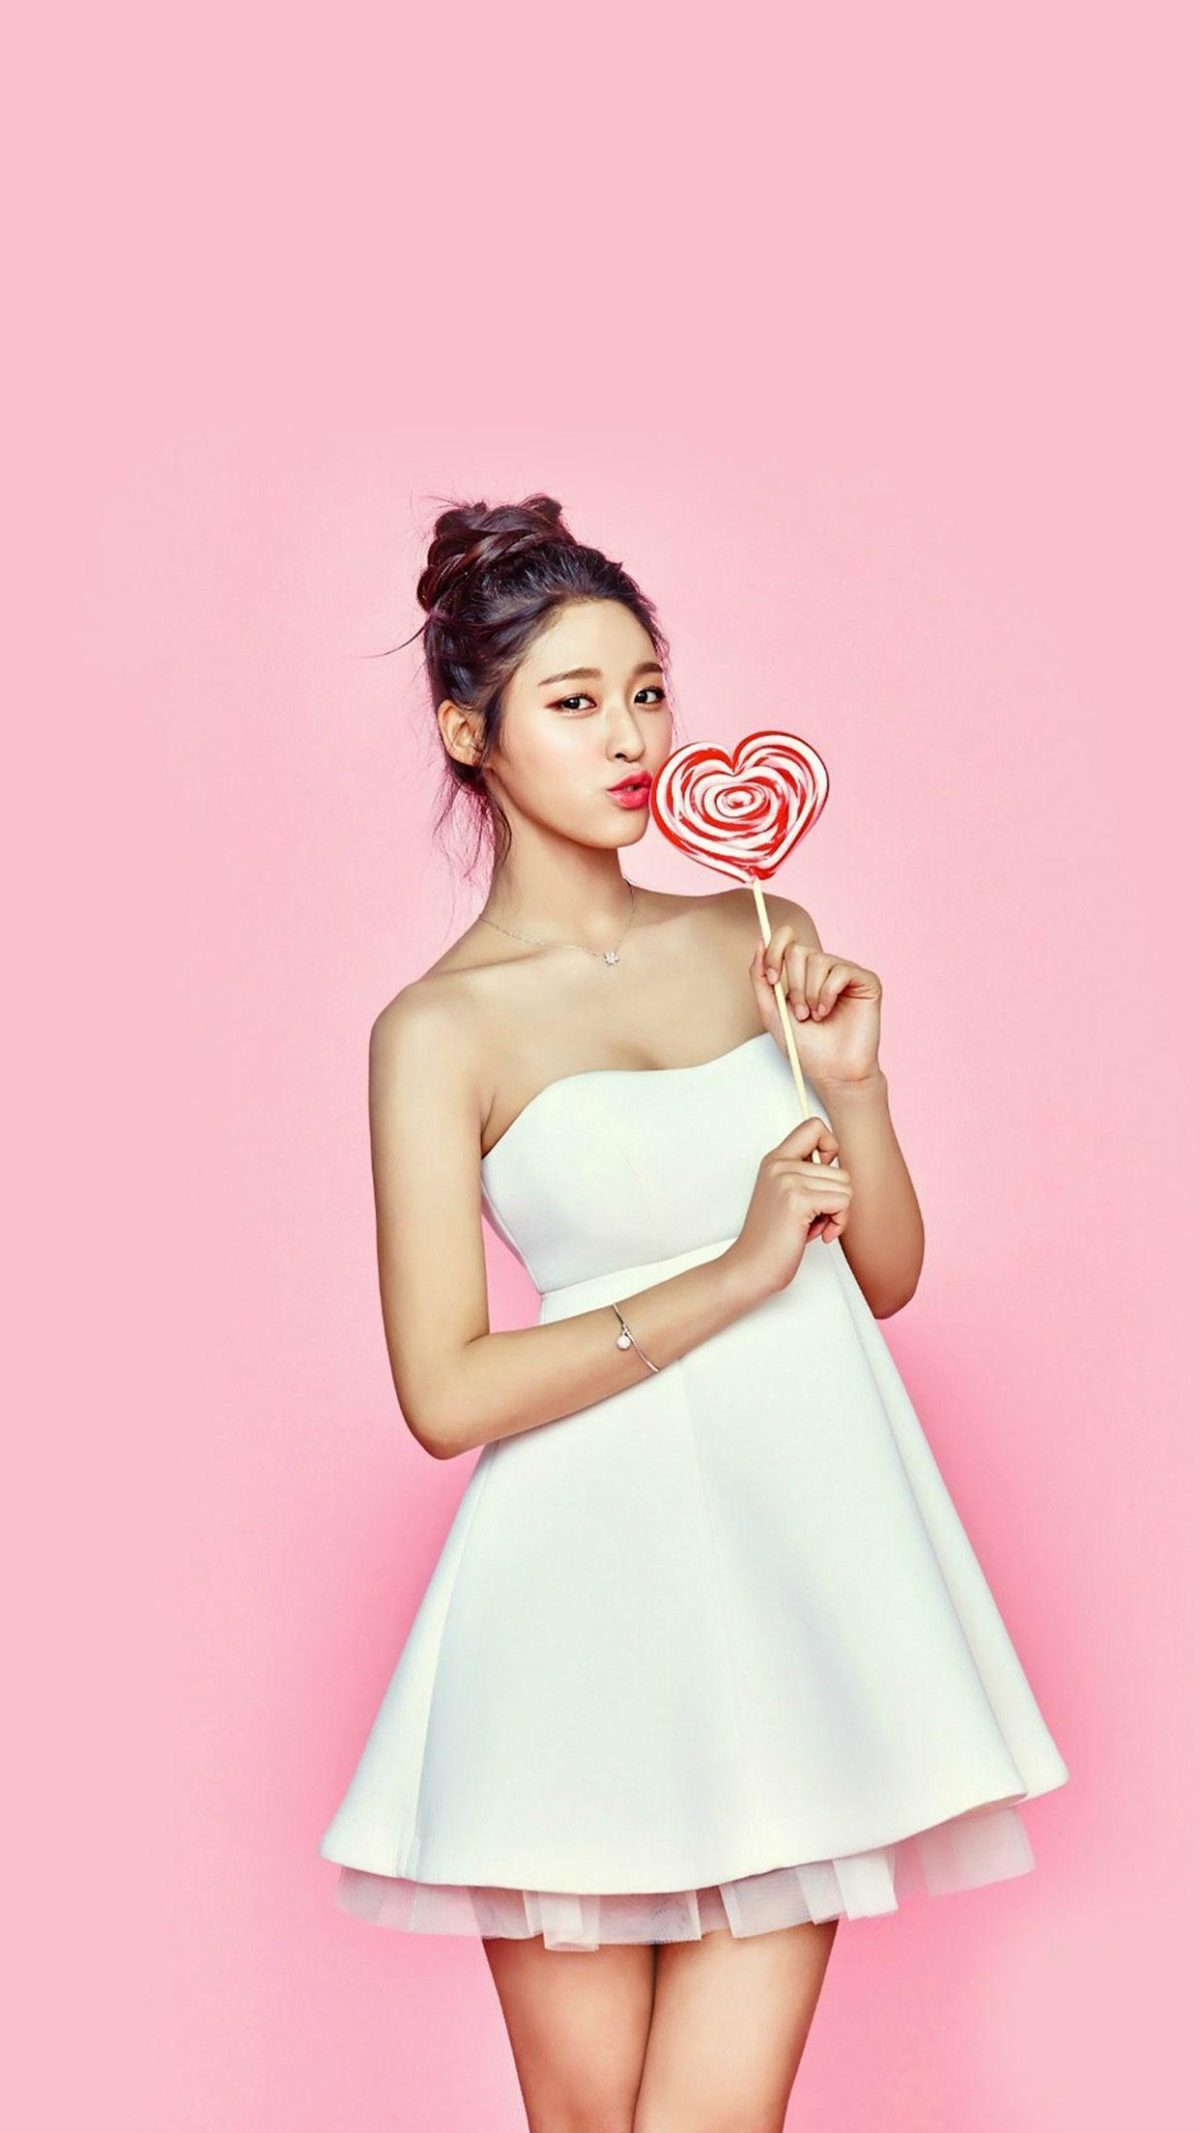 Genius Kpop Girl Cute – iPhone 6s Plus Wallpaper